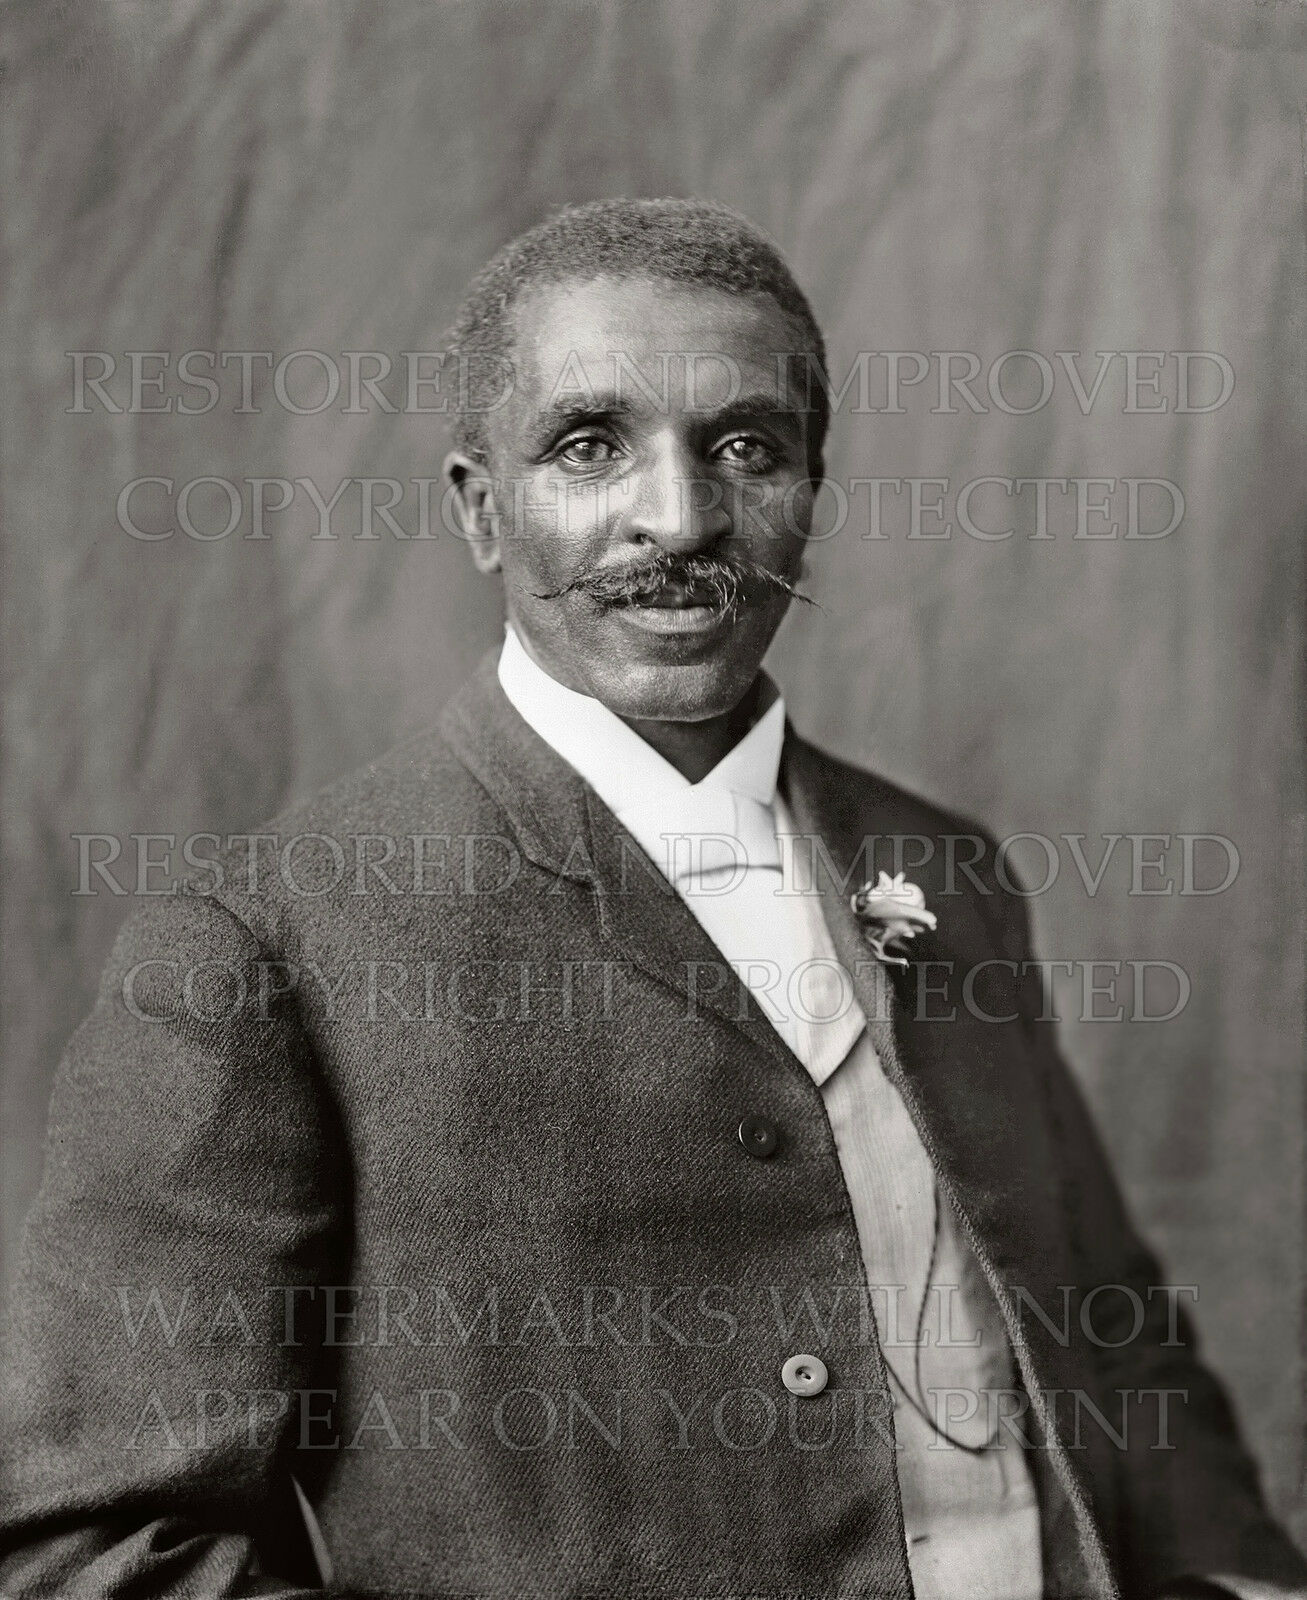 George Washington Carver Tuskegee Institute AL photos lot